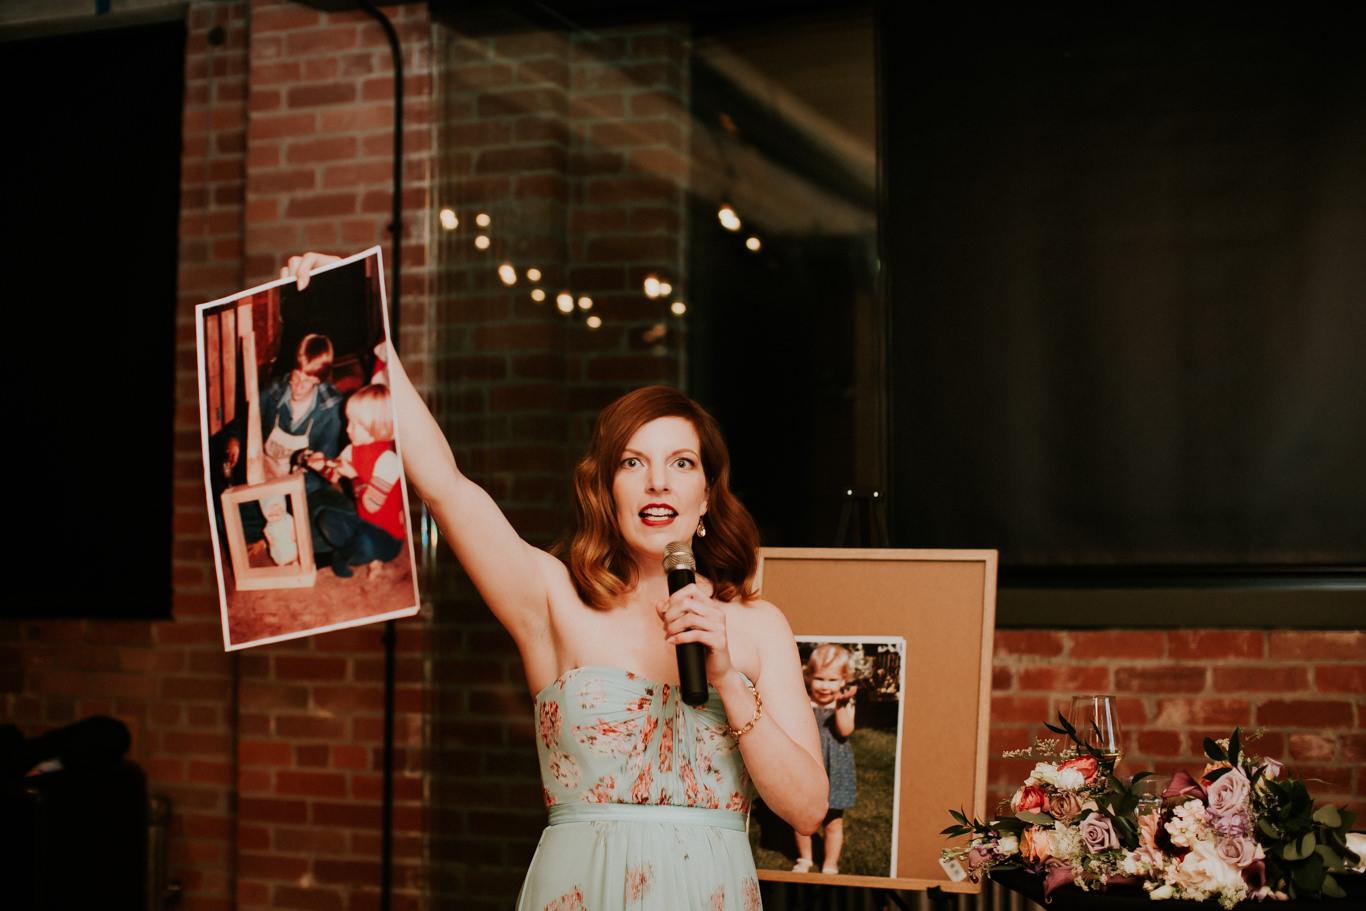 Lindsay-and-Heather-Charbar-Restaurant-Wedding-in-Calgary-162